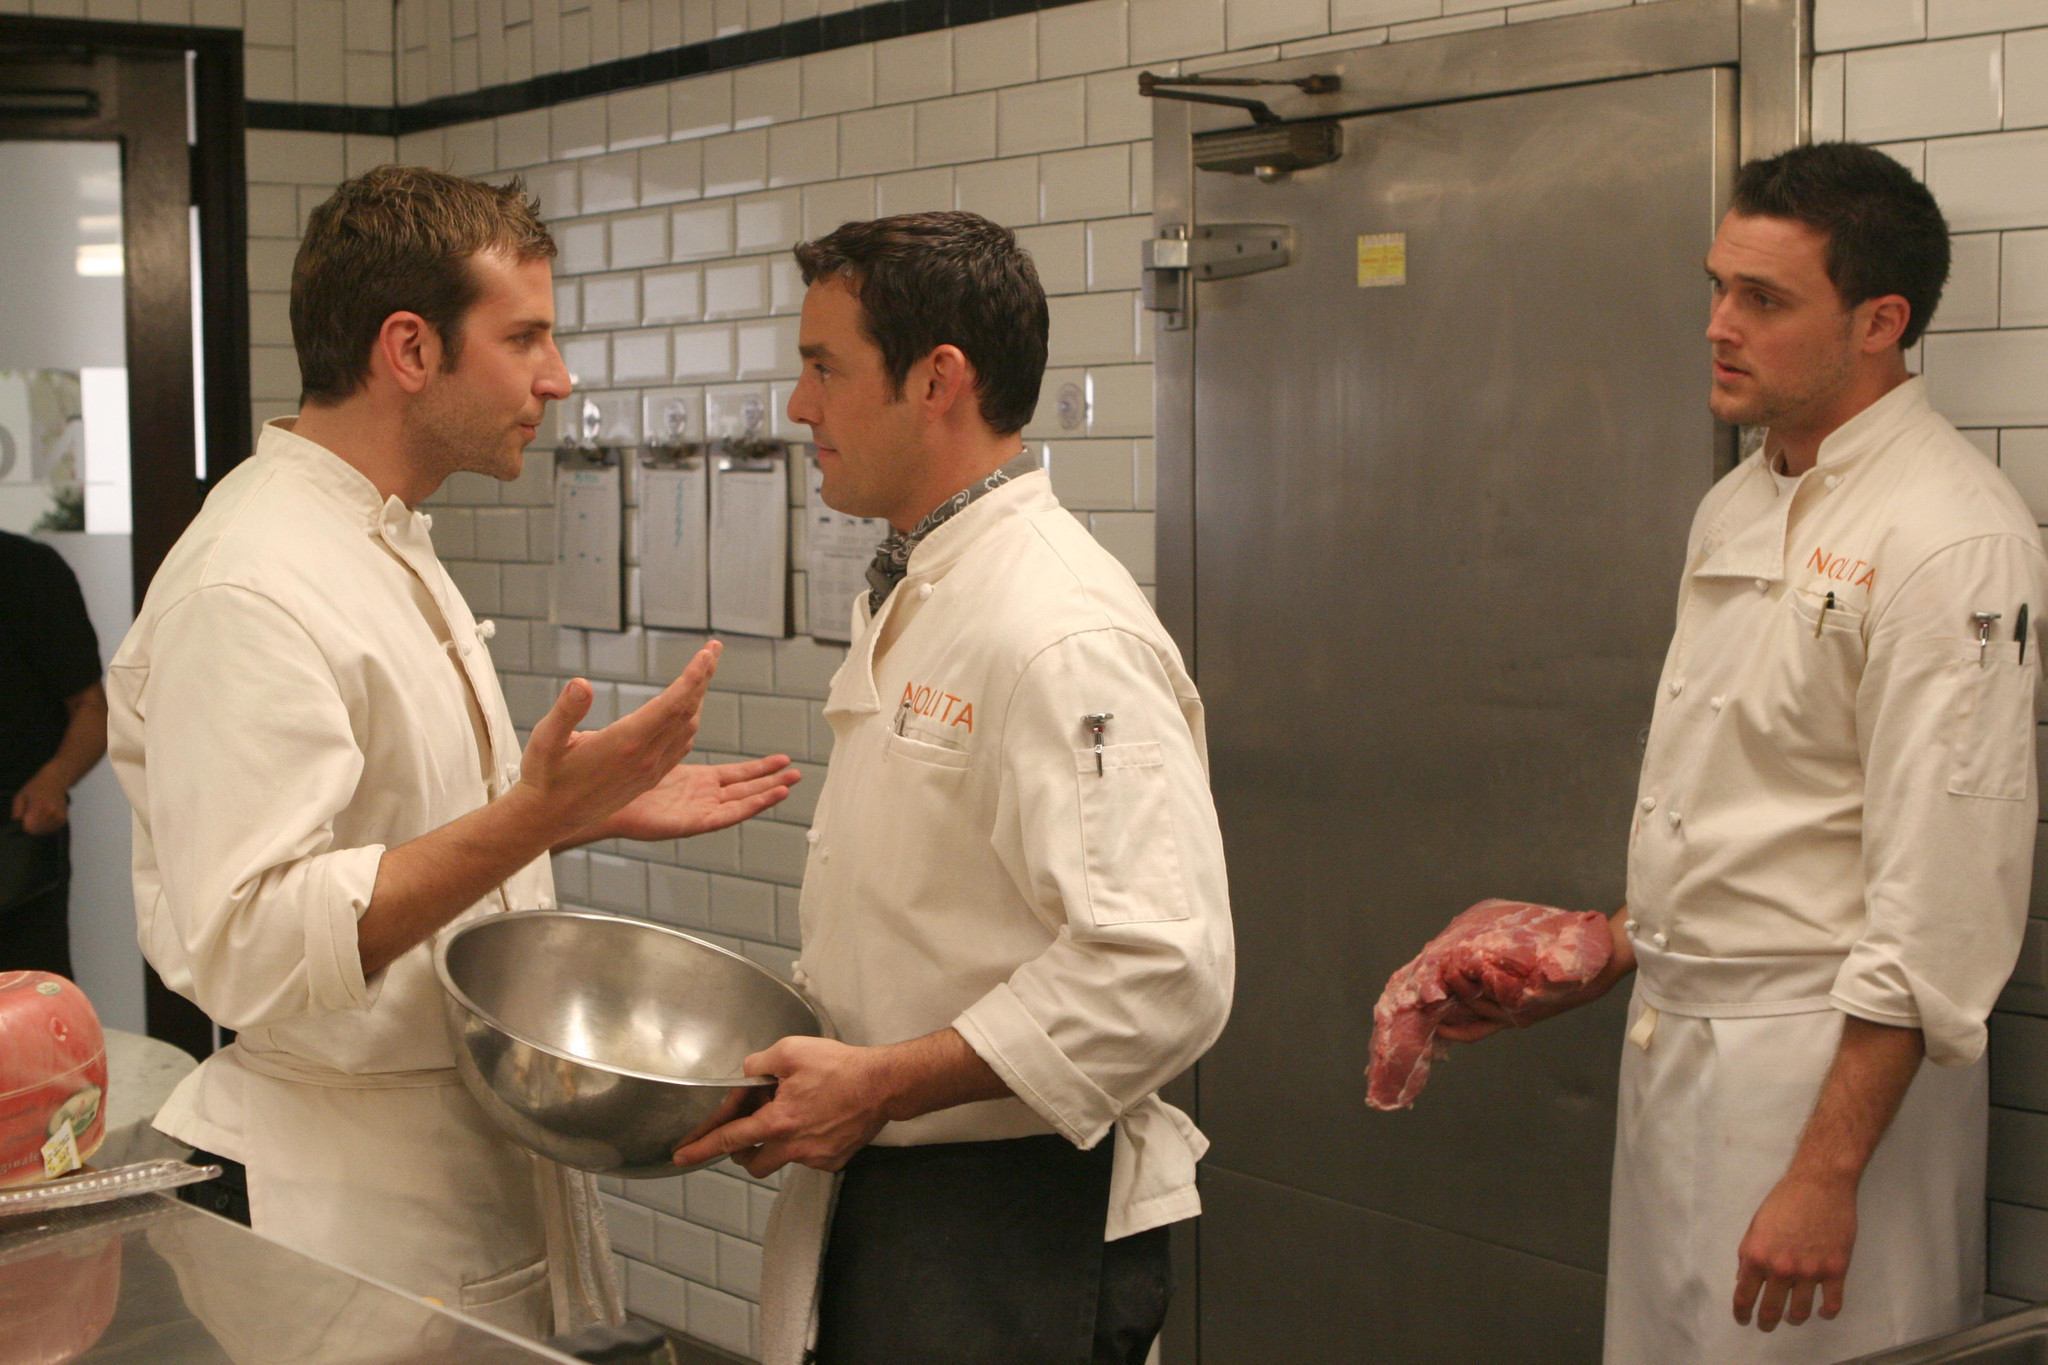 la-dd-bradley-cooper-hot-chef-burnt-20150811